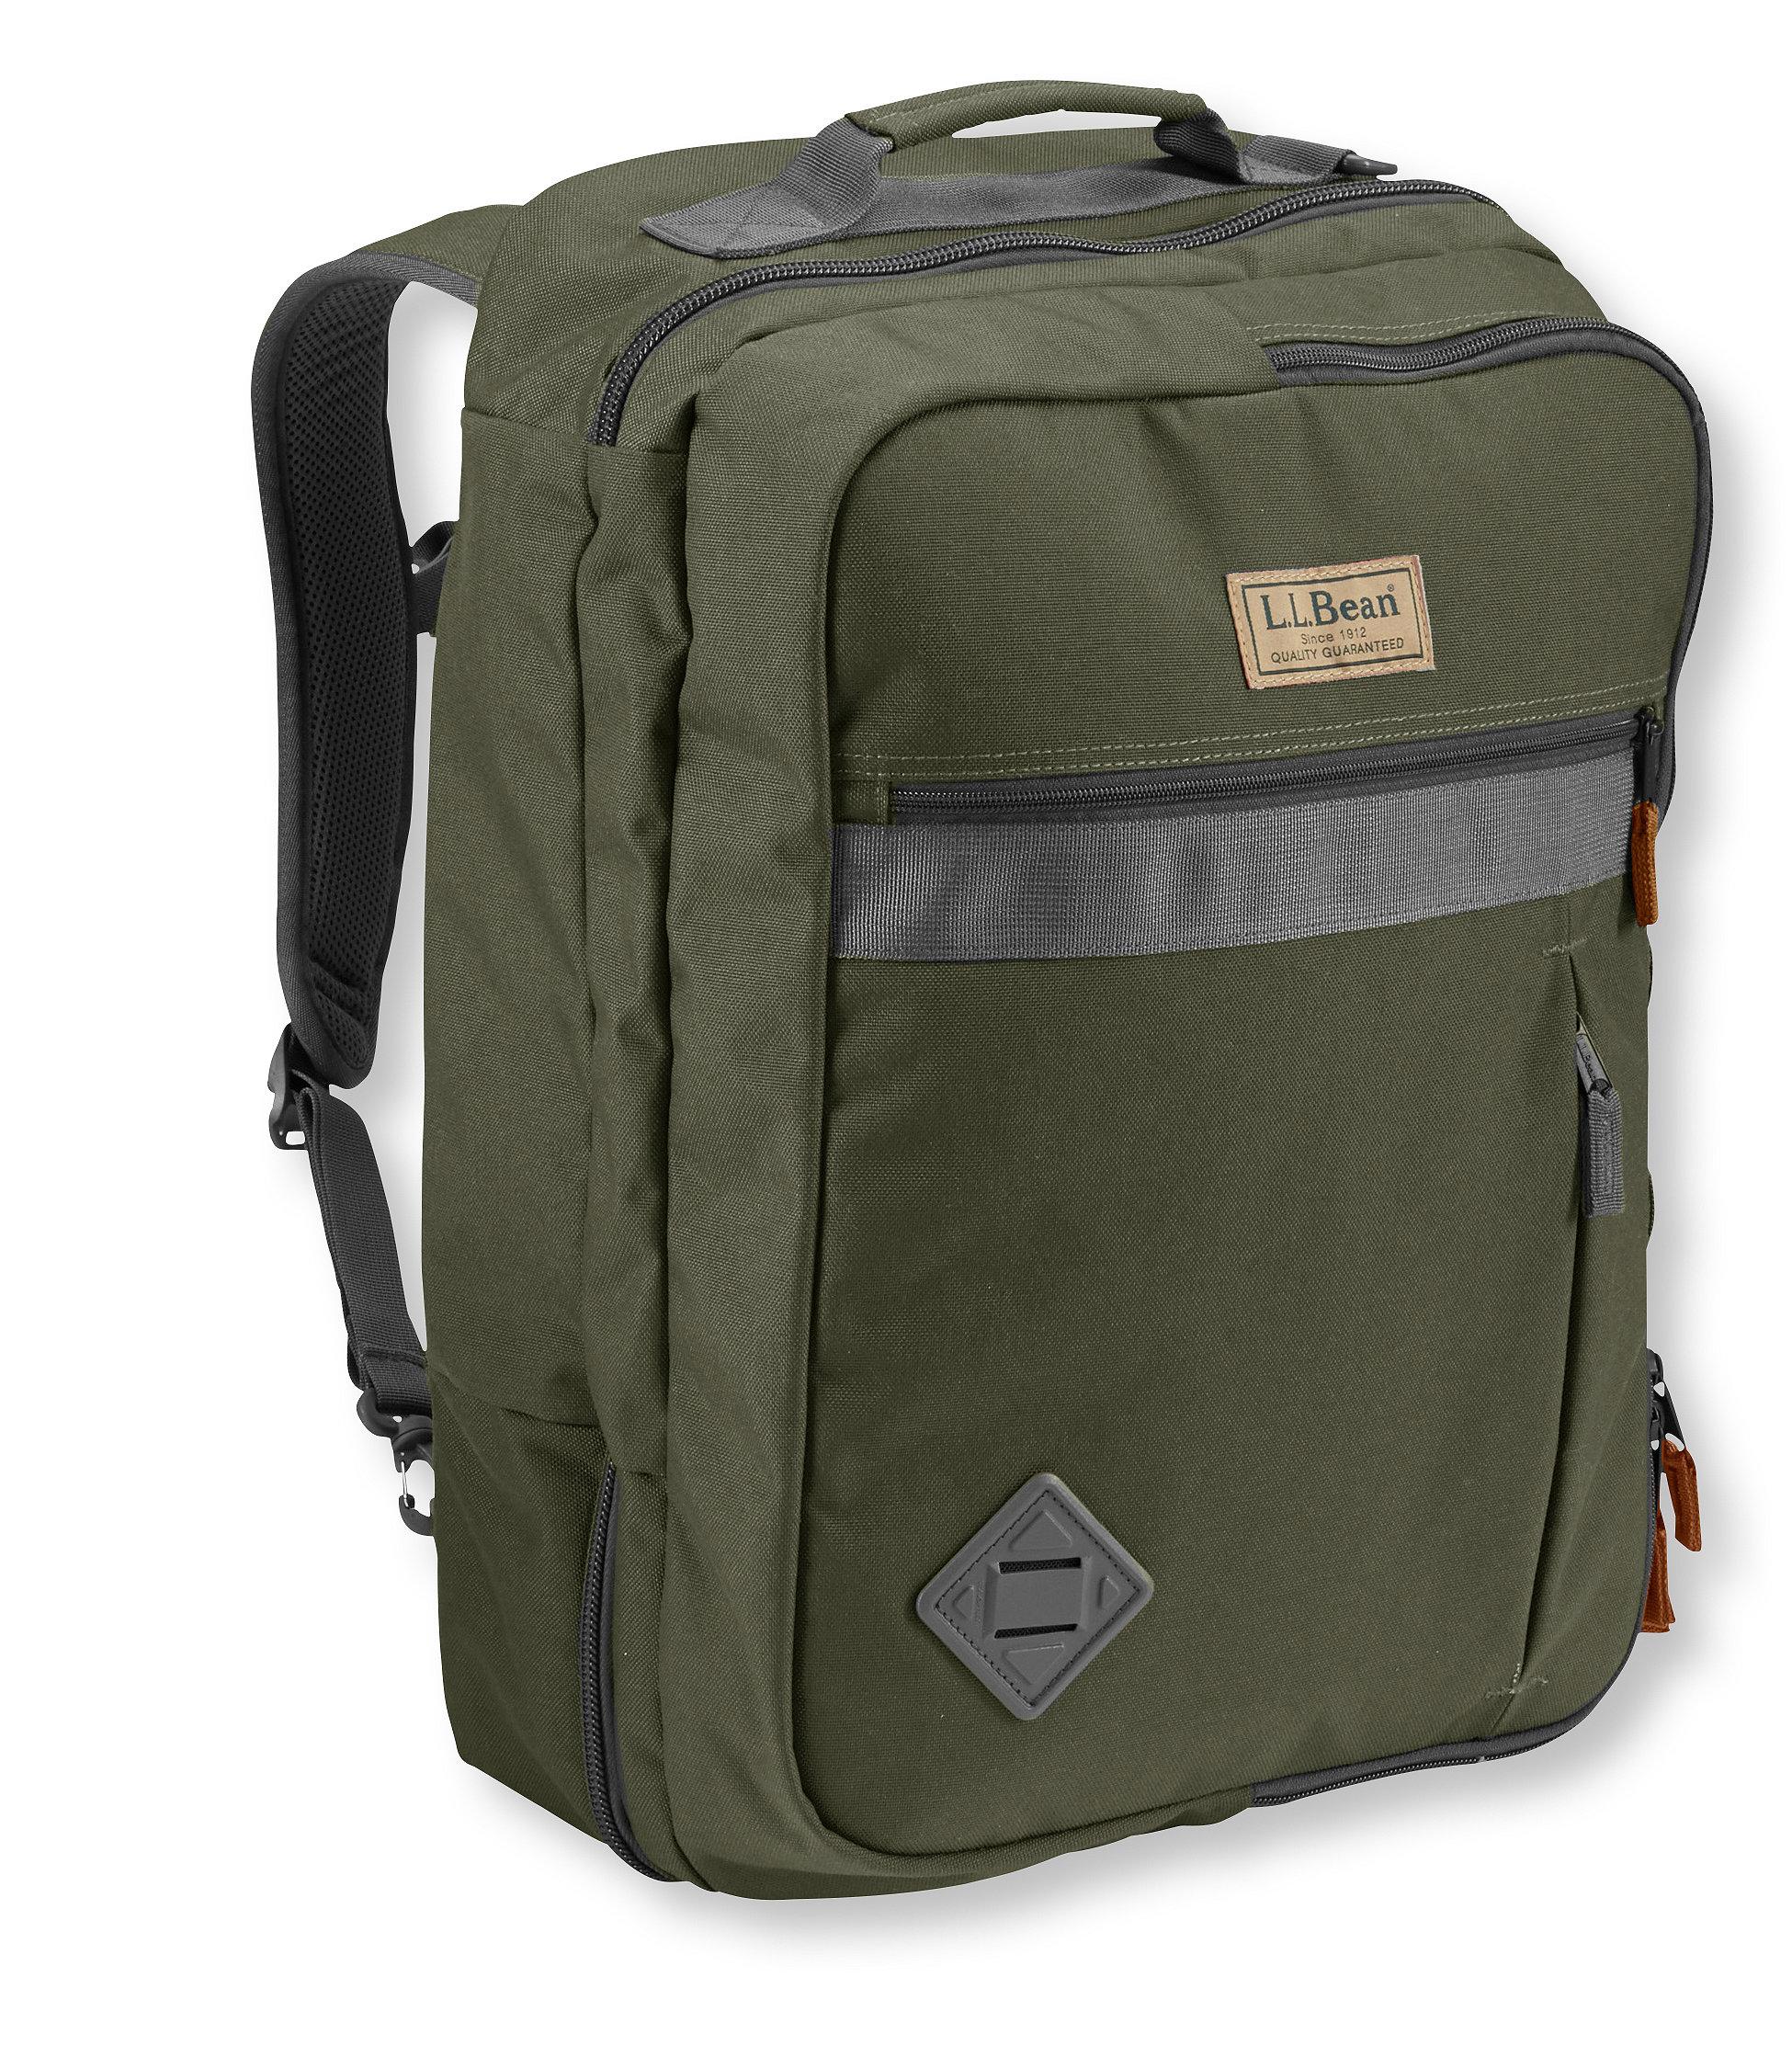 L.L.Bean Continental Travel Pack